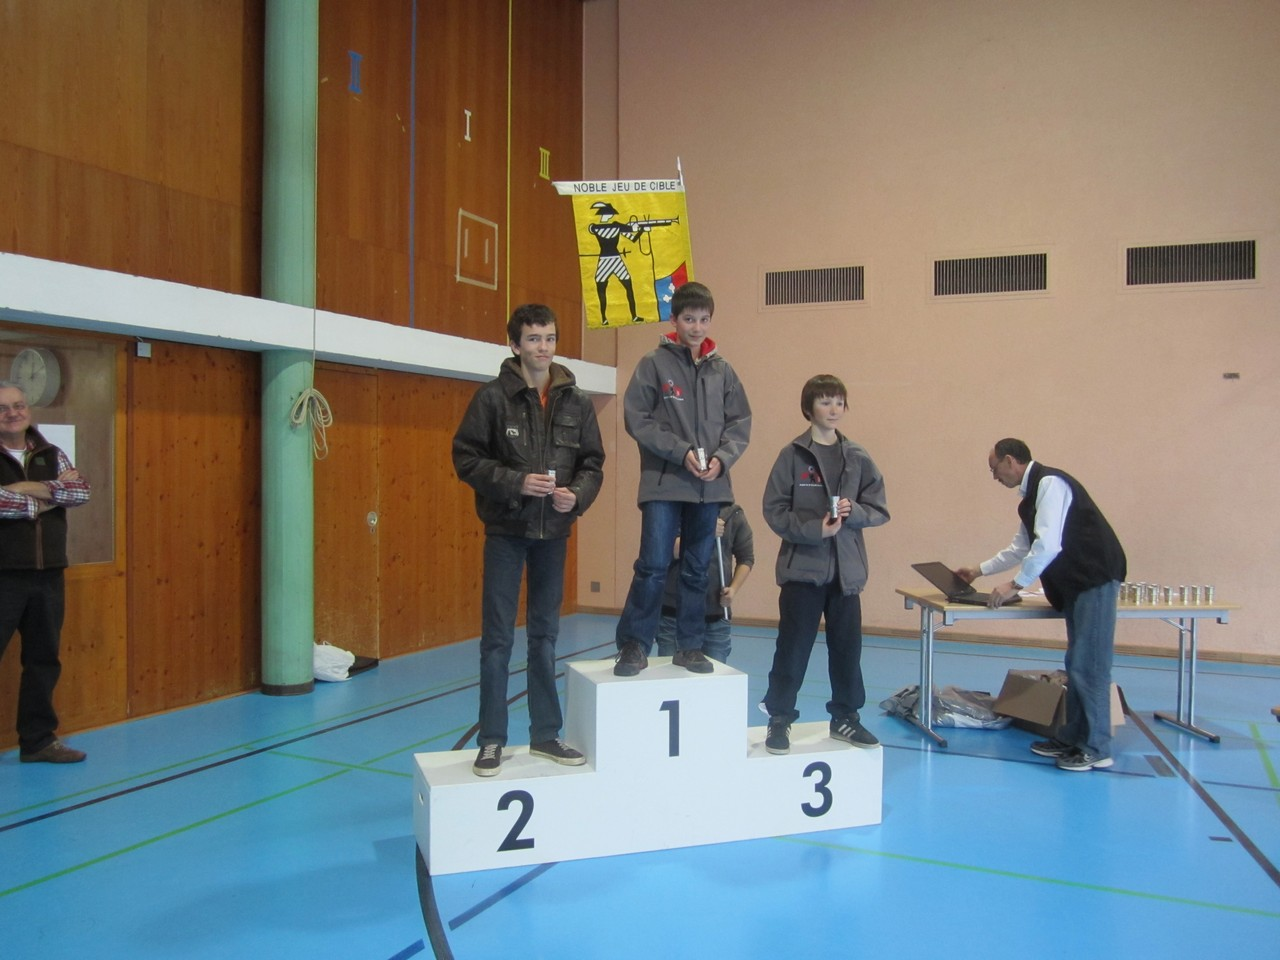 2010 CVAR Final 10m